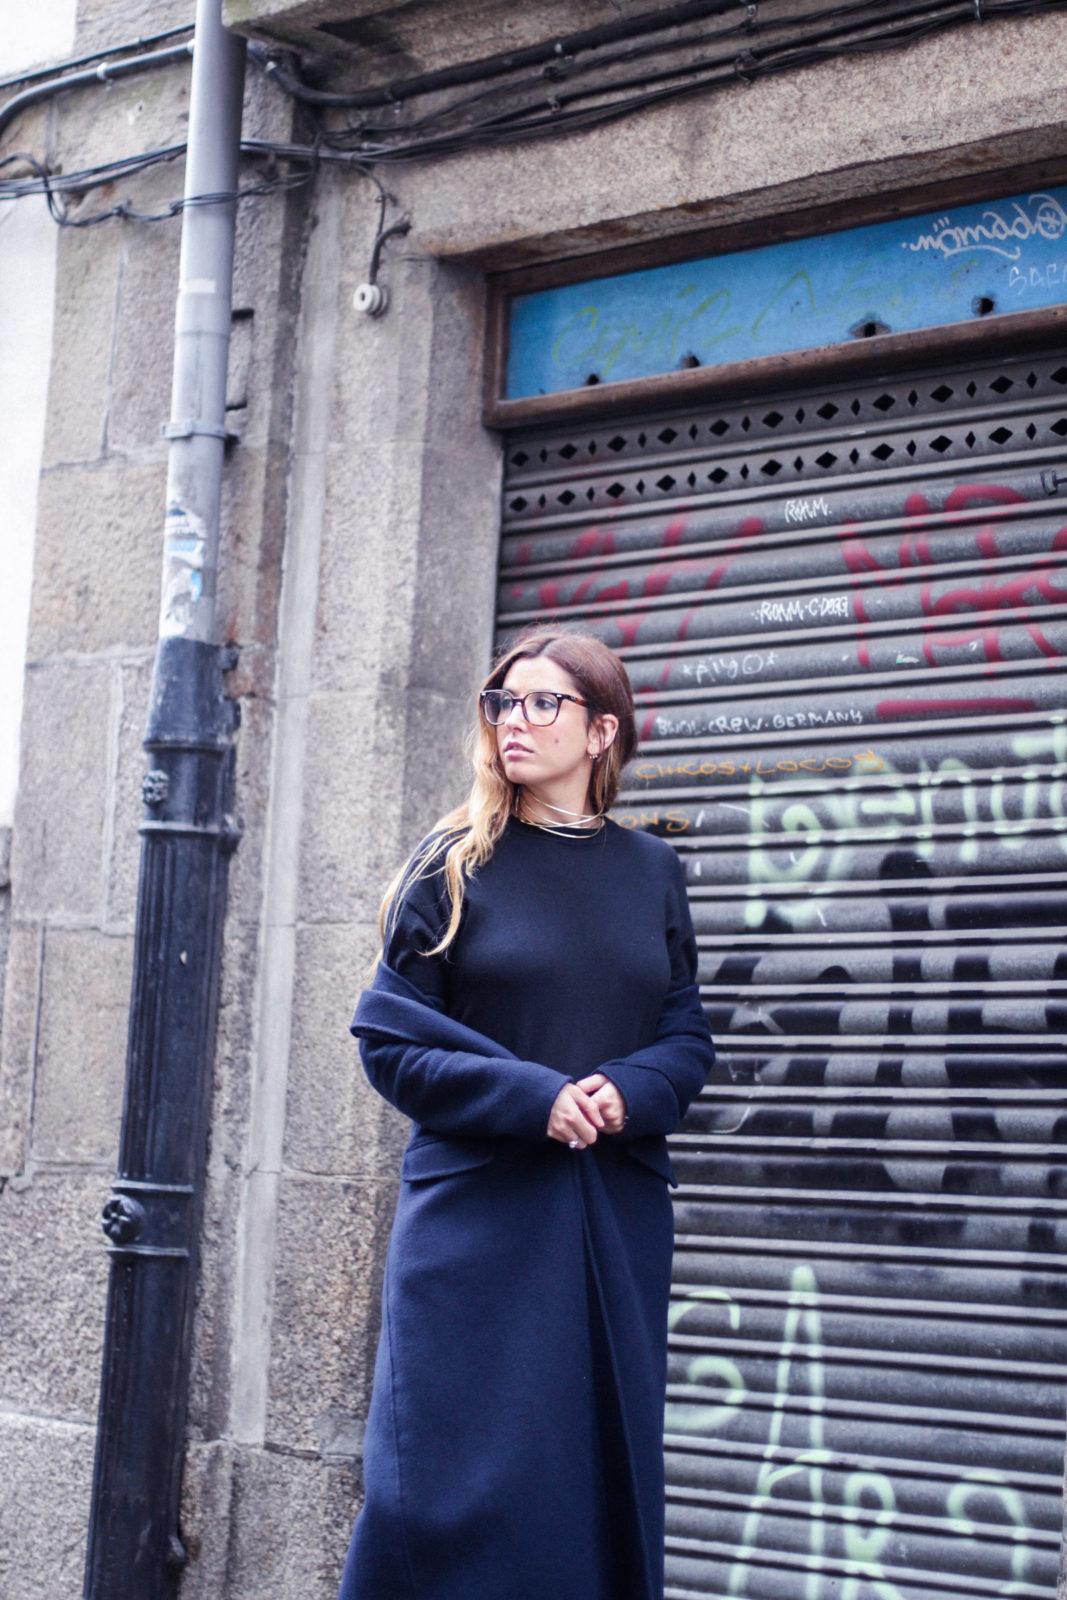 vestido_de_punto_midi_vans_calcetines_rejilla_choker_metalico_happiness_boutique_abrigo_largo_gucci_street_style_fall_2016_donkeycool-36